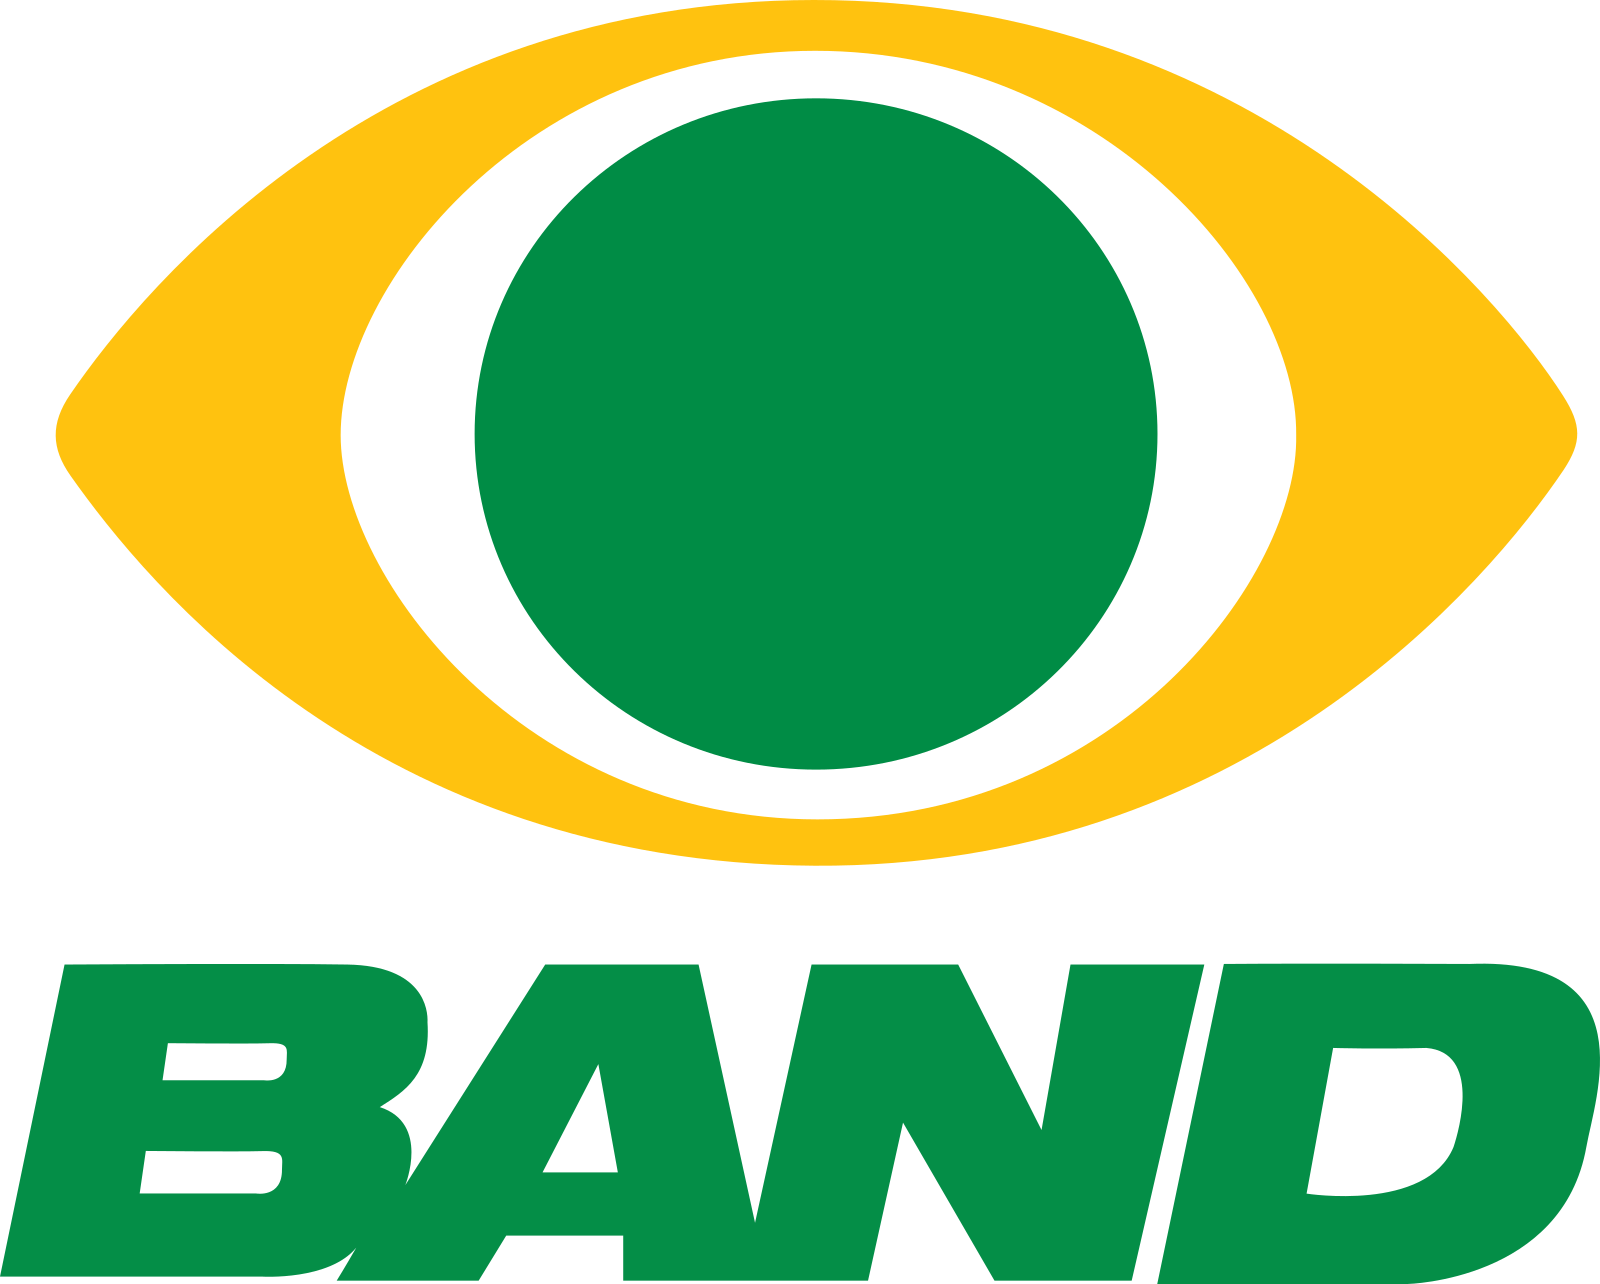 N.e.r.d Band Logo band-logo-tv-5 ...